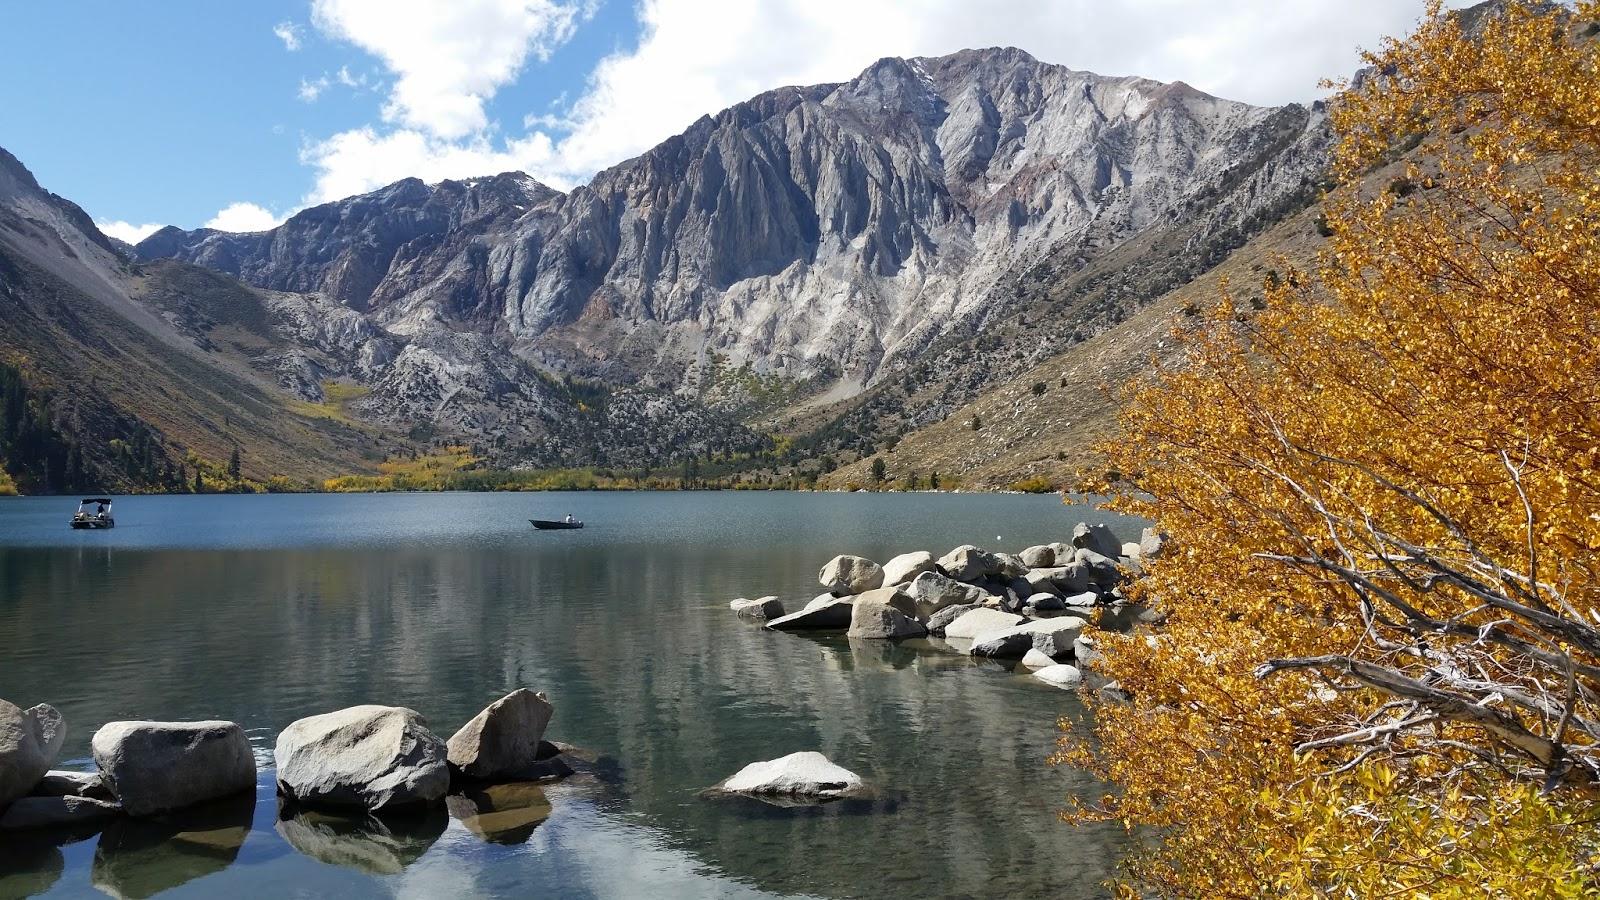 Wes' Travels to California Lakes: November 2017